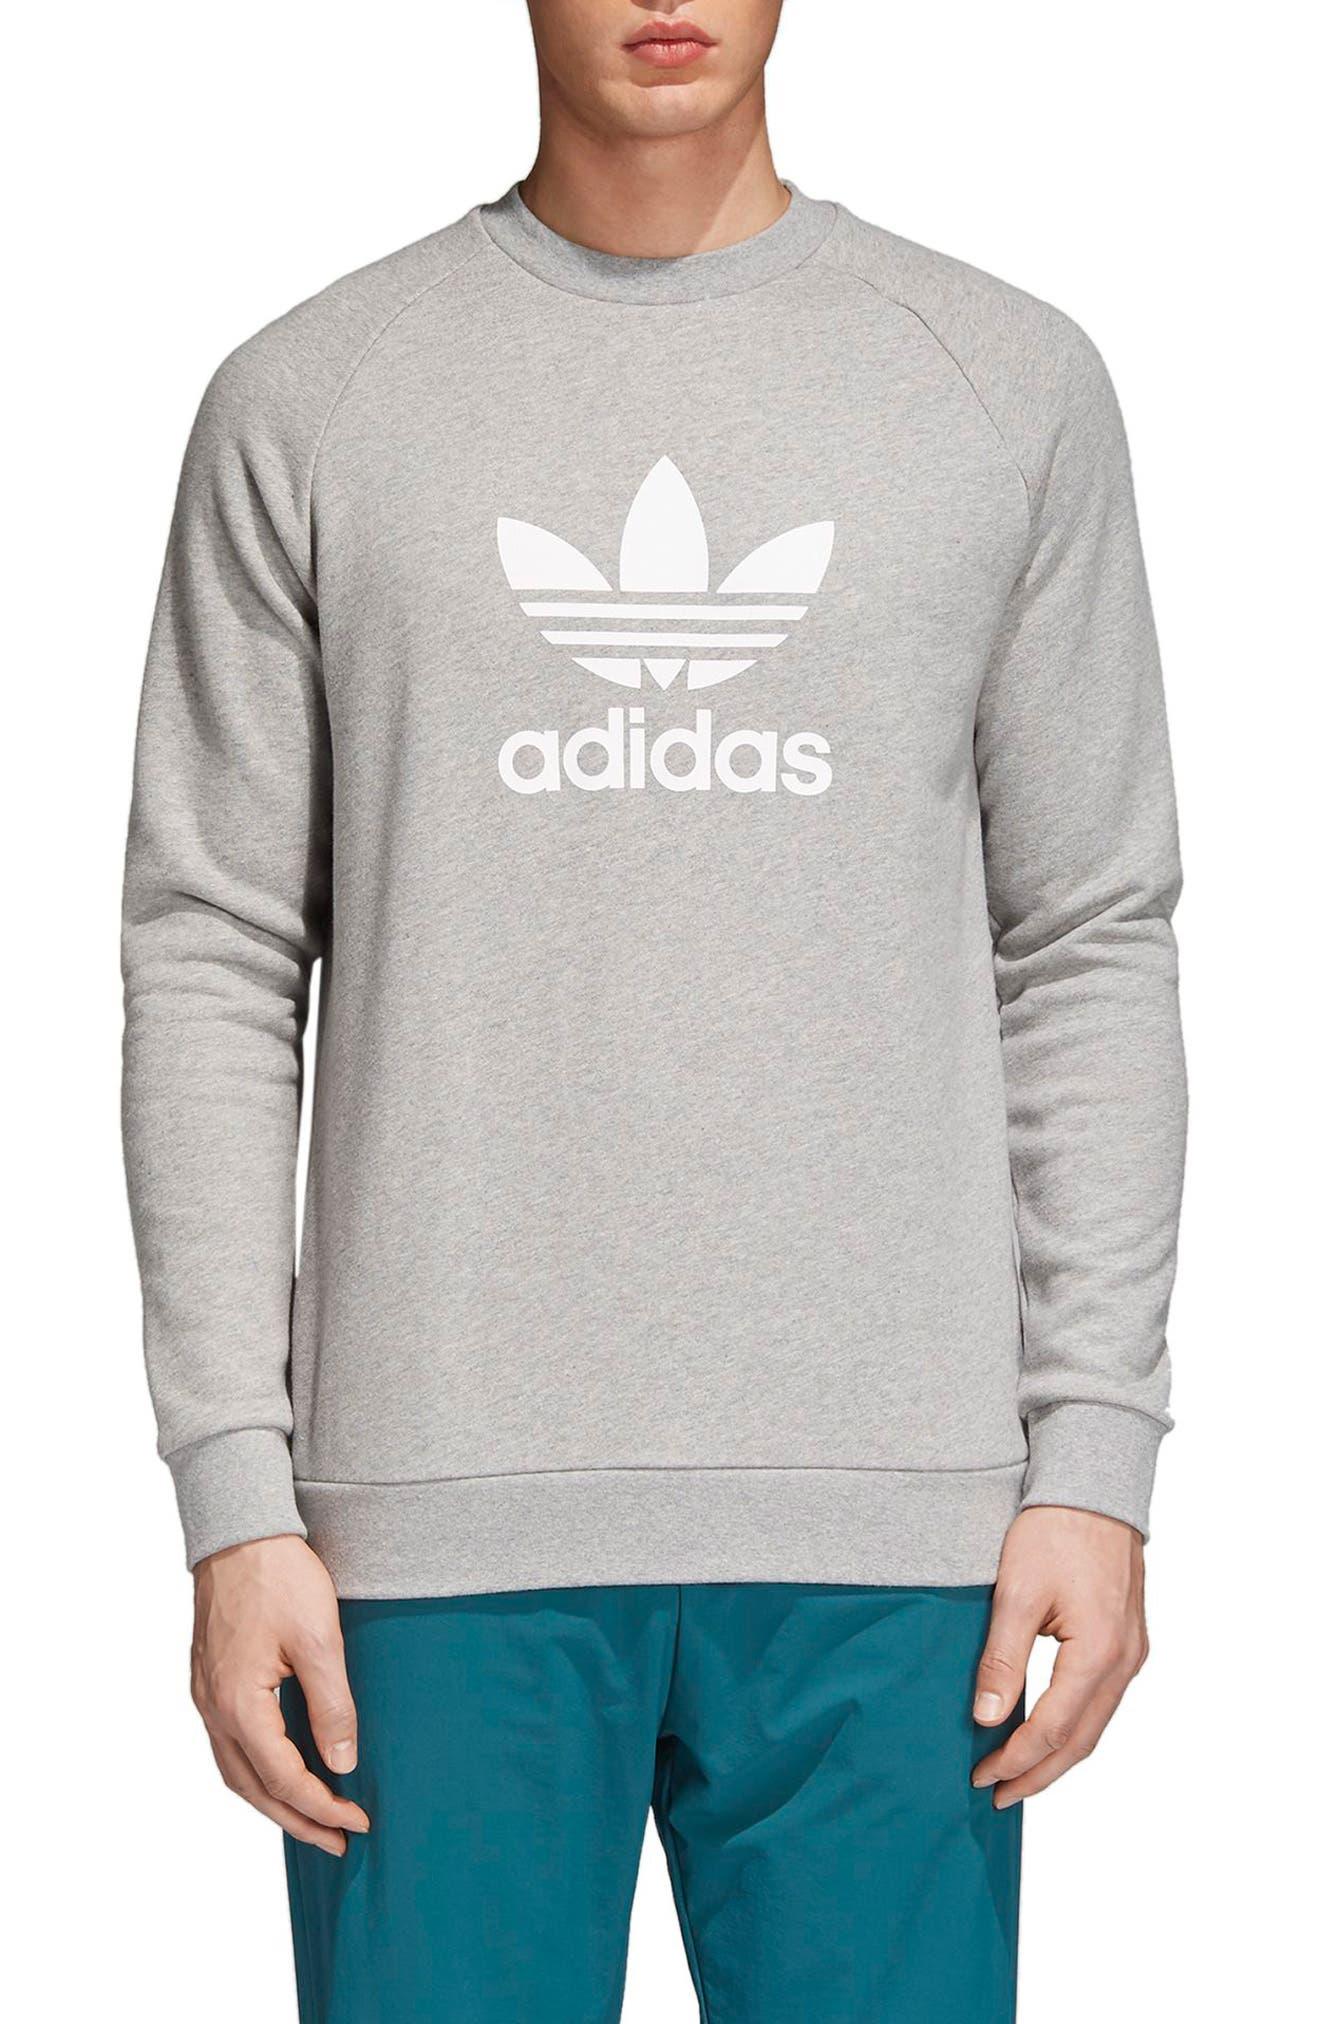 ADIDAS ORIGINALS, adidas Trefoil Crewneck Sweatshirt, Main thumbnail 1, color, MEDIUM GREY HEATHER